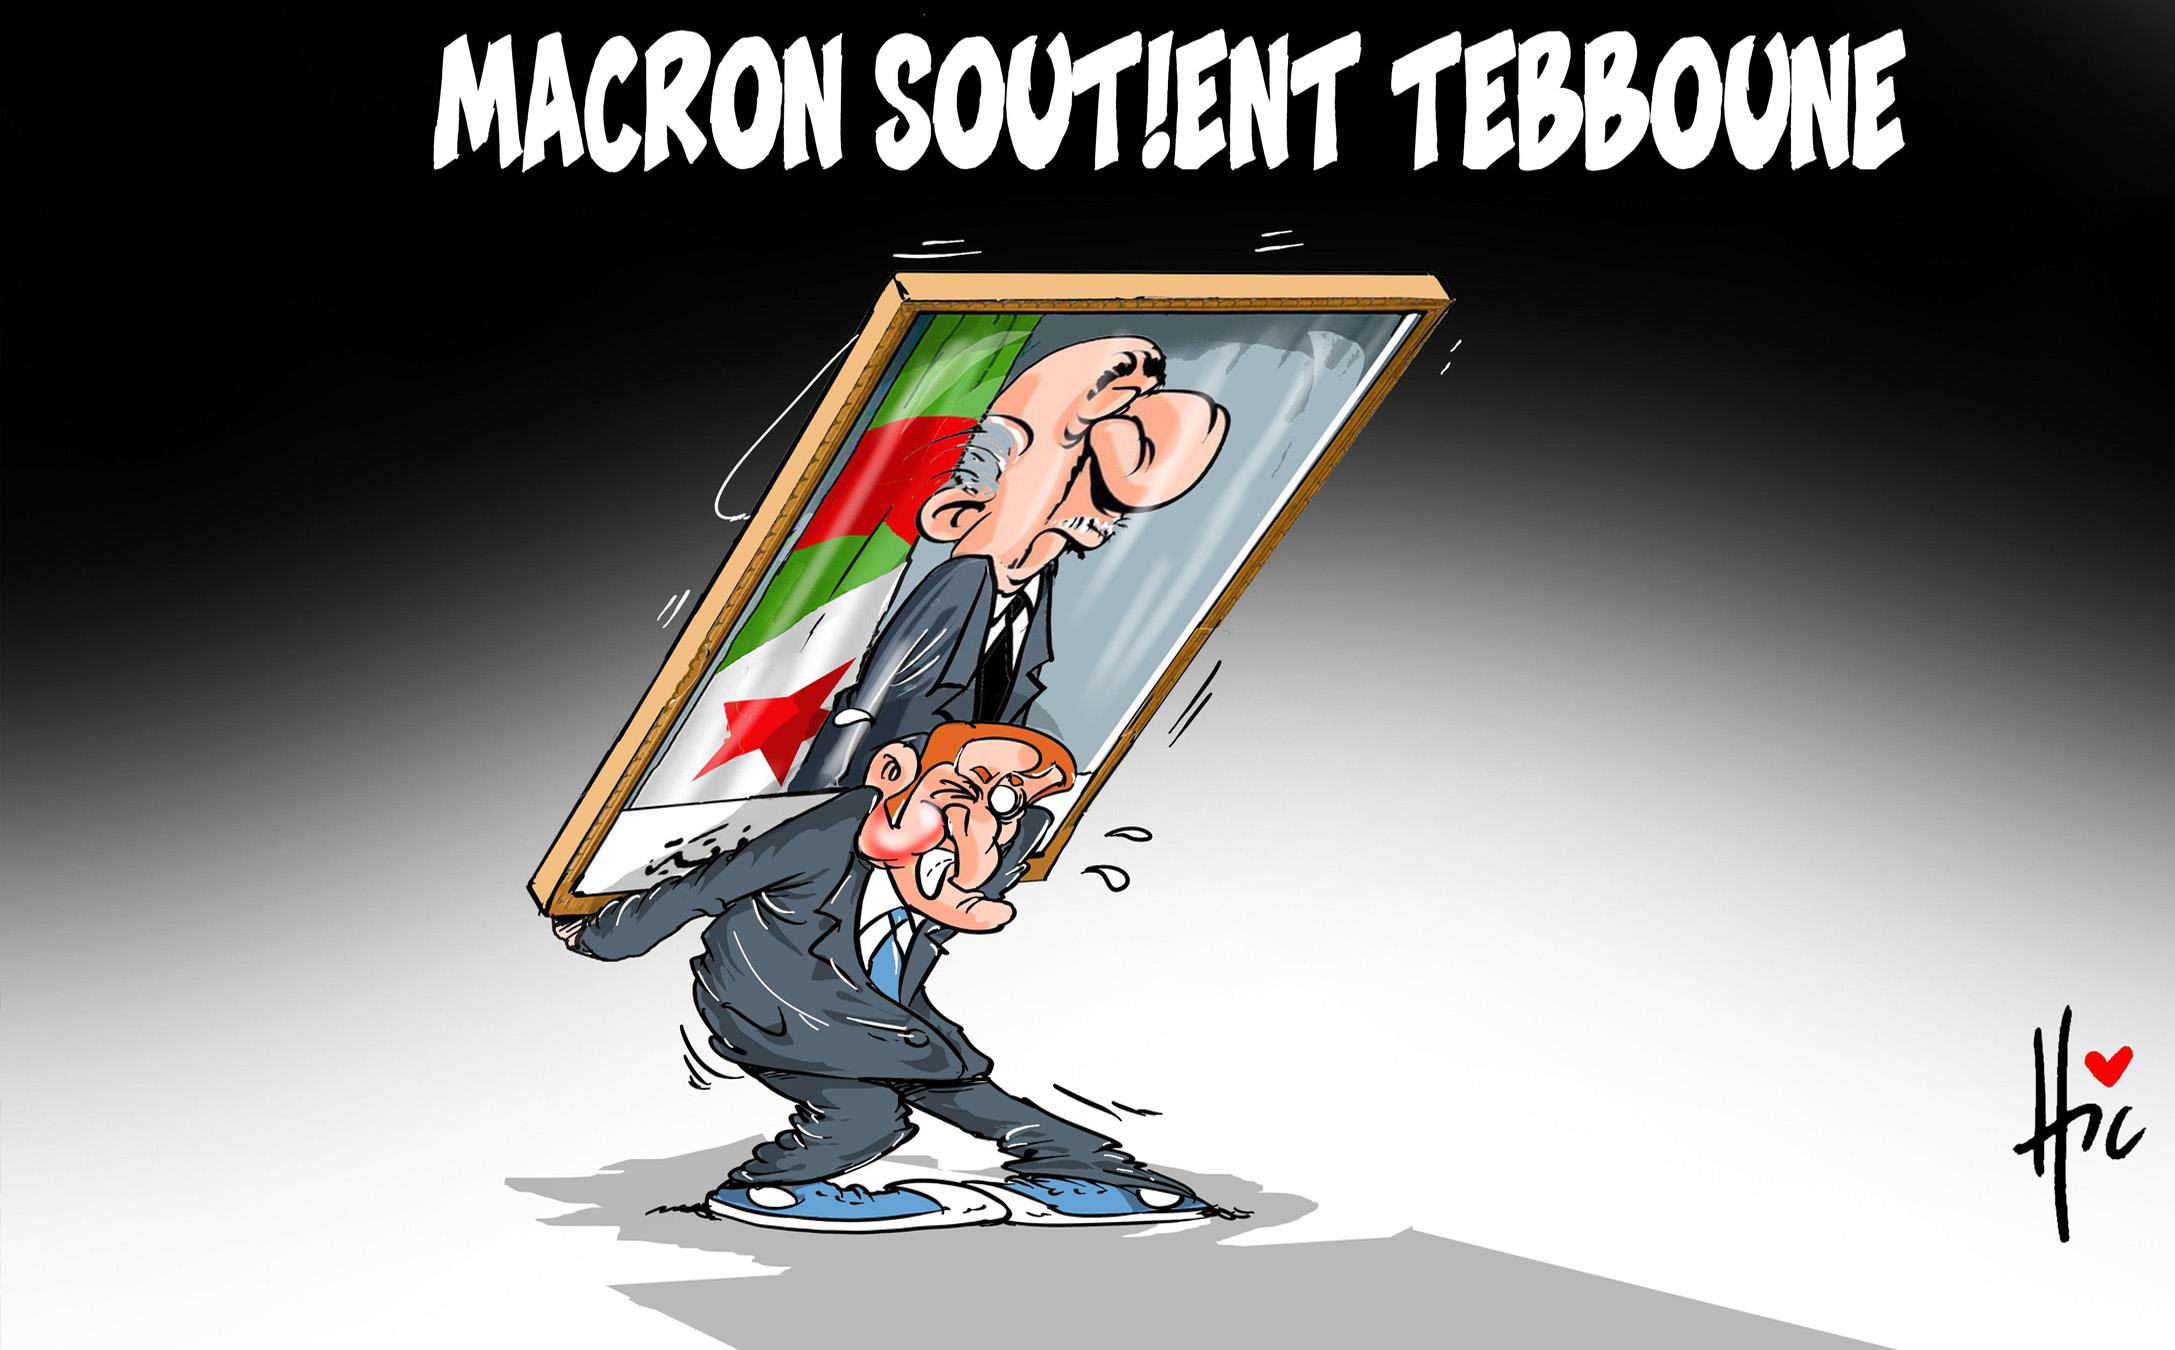 Macron soutient Tebboune - Le Hic - El Watan - Gagdz.com